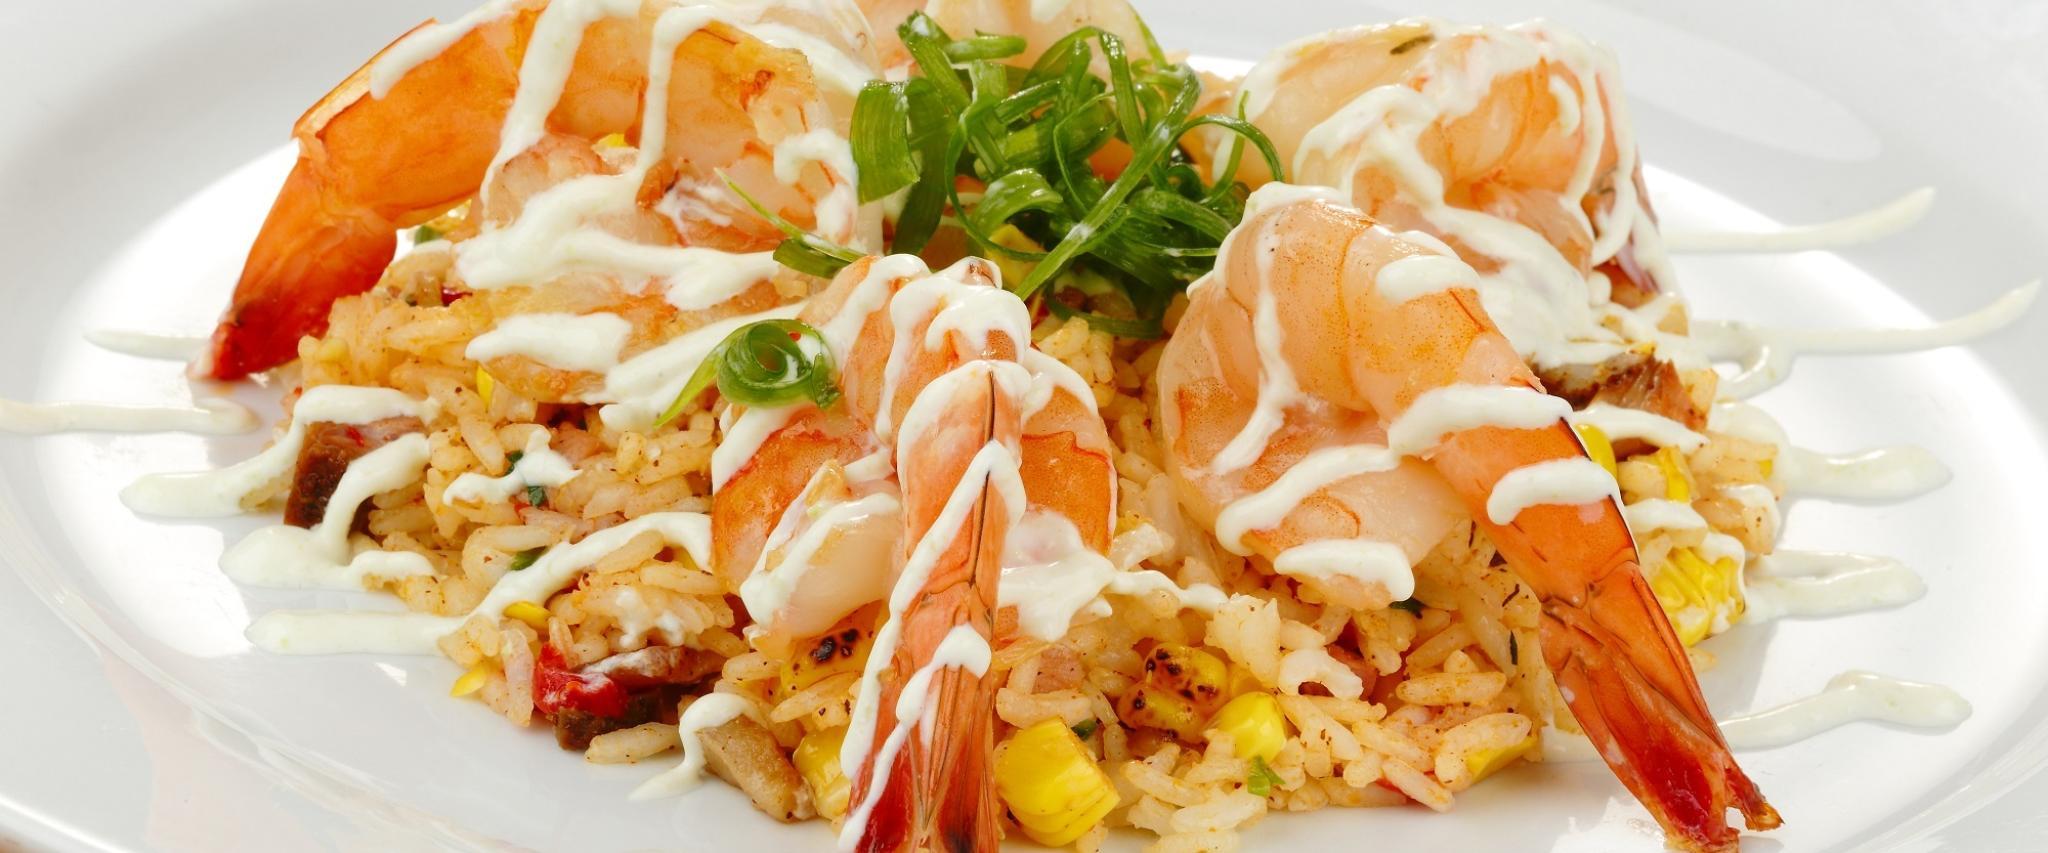 Food Trails Gulf Shores Orange Beach